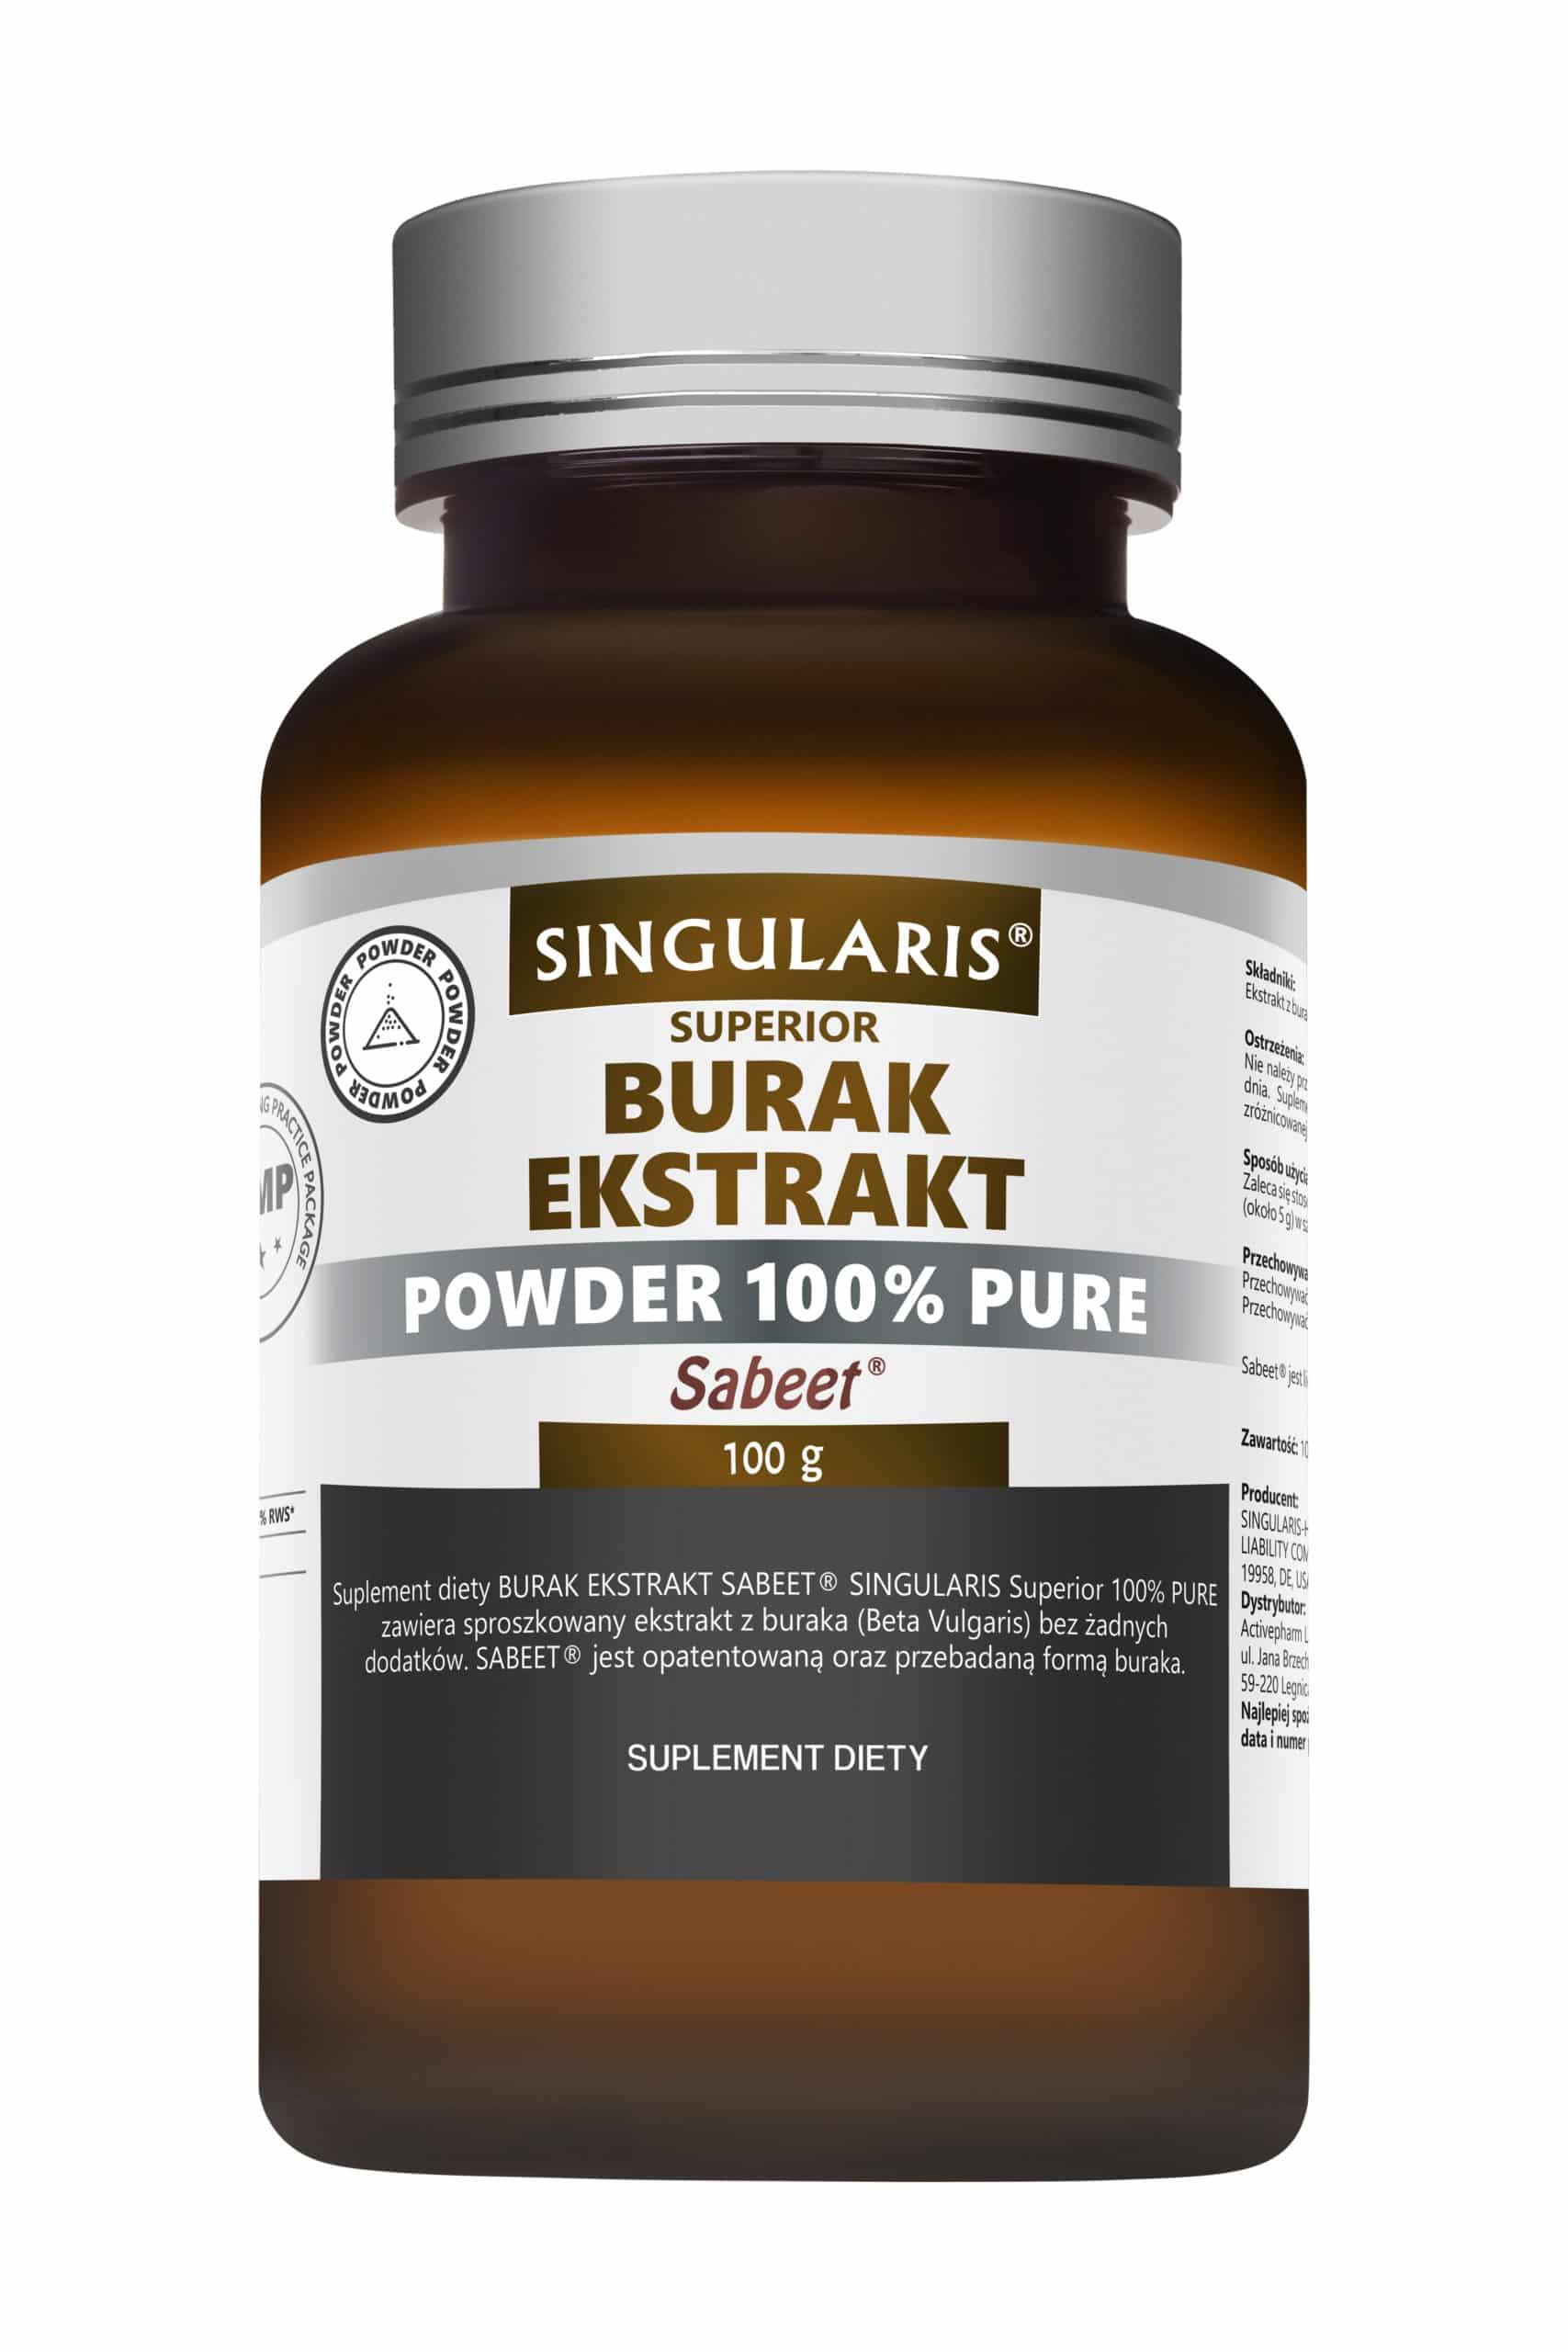 BURAK EKSTRAKT SABEET® POWDER 100% PURE SINGULARIS® SUPERIOR - 100g